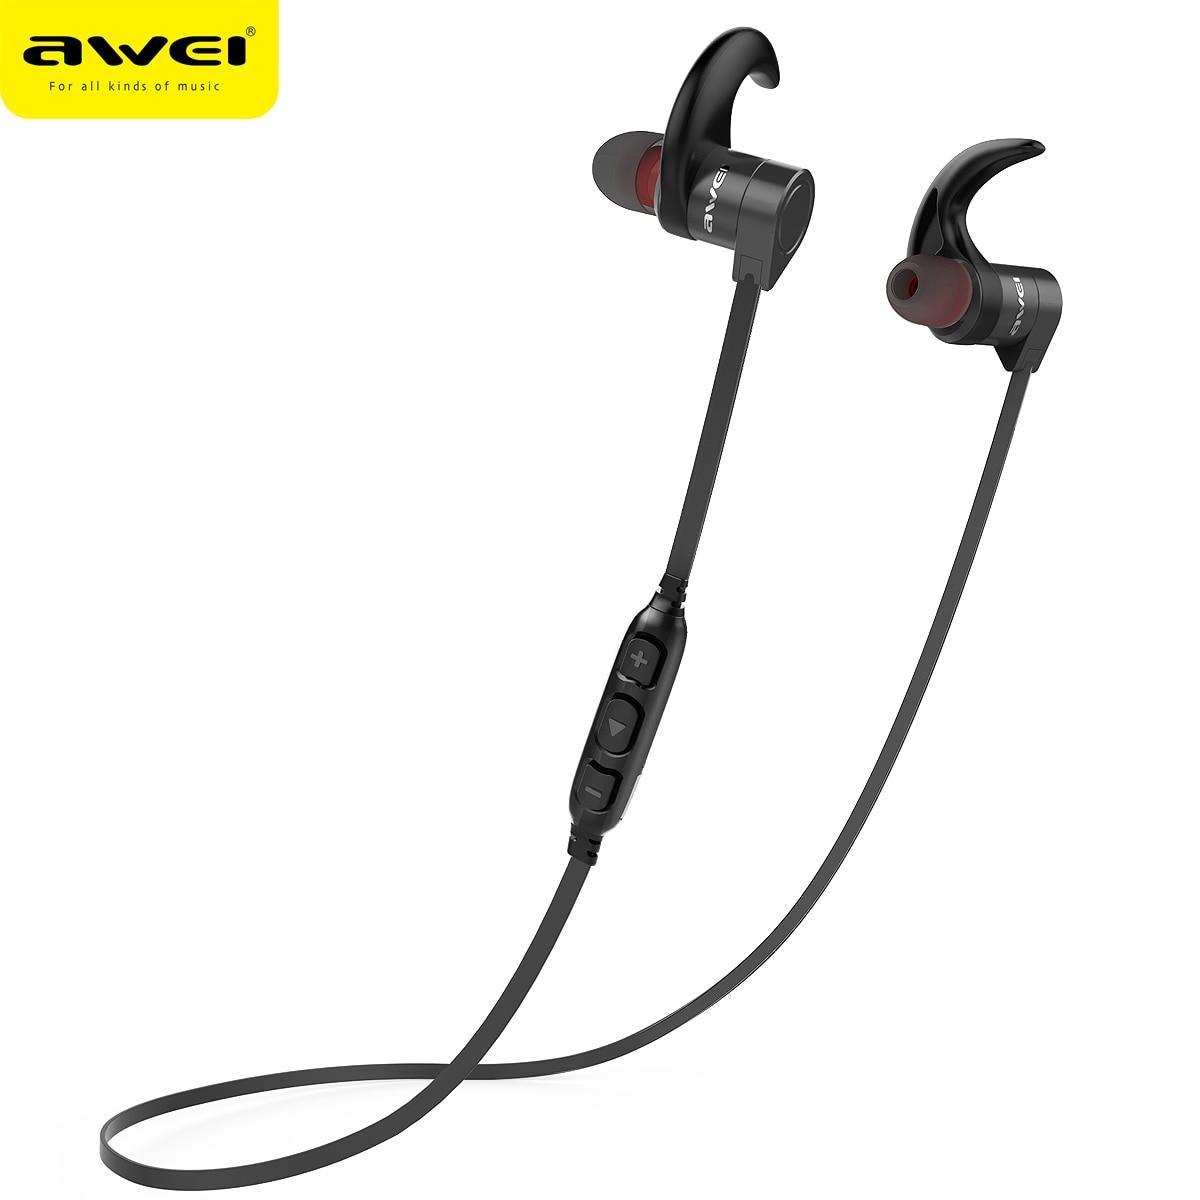 AWEI AK3 auricular inalámbrico Bluetooth auriculares magnéticos auriculares Blutooth auricular inalámbrico auriculares auricular Casque kulakl k